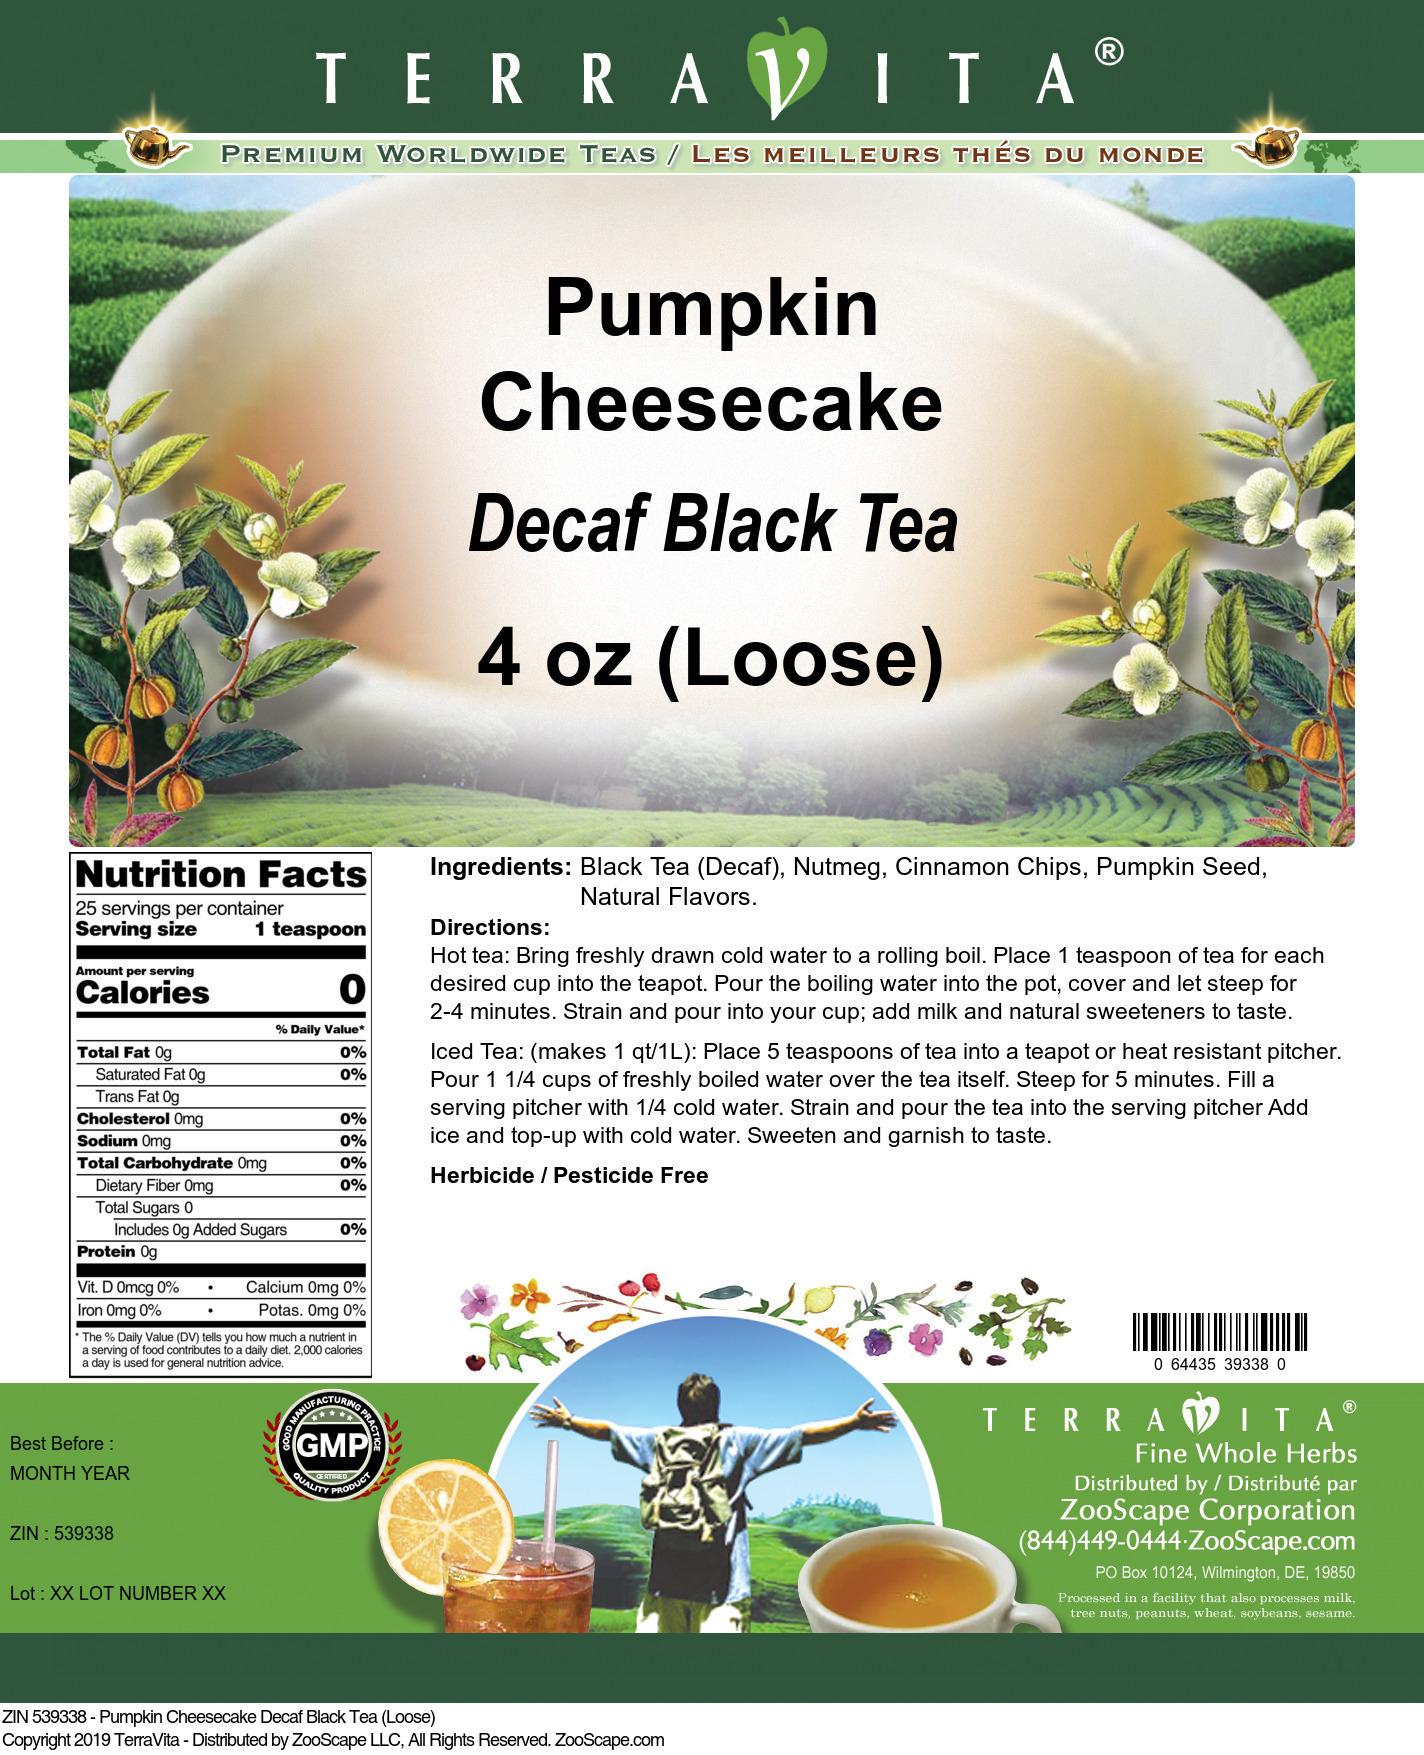 Pumpkin Cheesecake Decaf Black Tea (Loose)